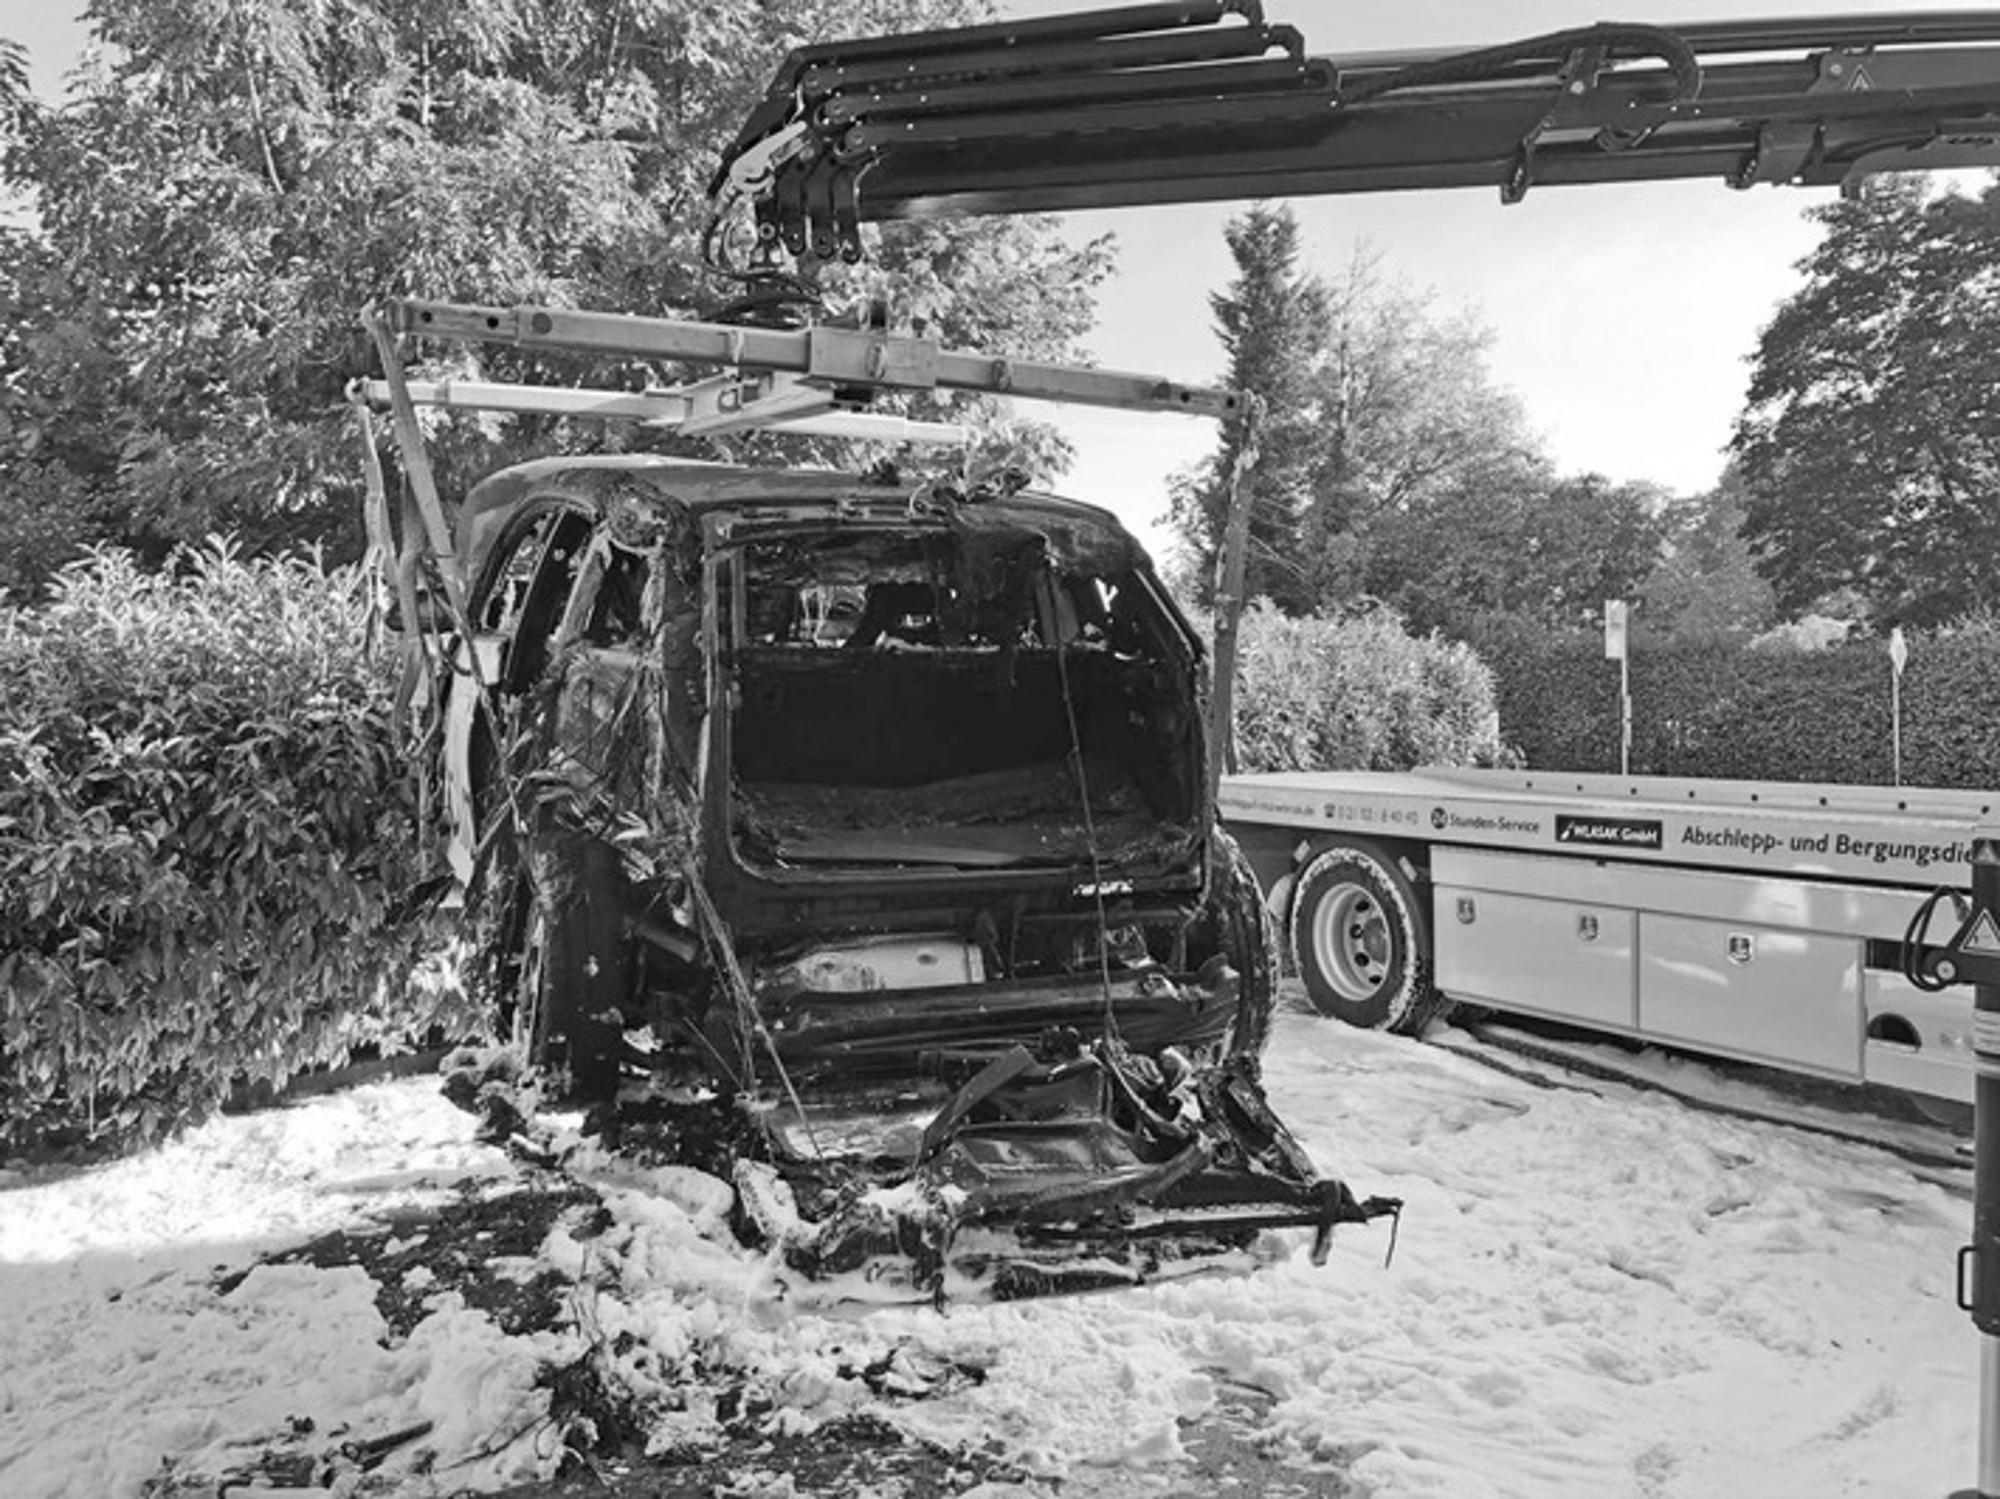 Heroes Push Burning BMW Hybrid Away From Petrol Pumps